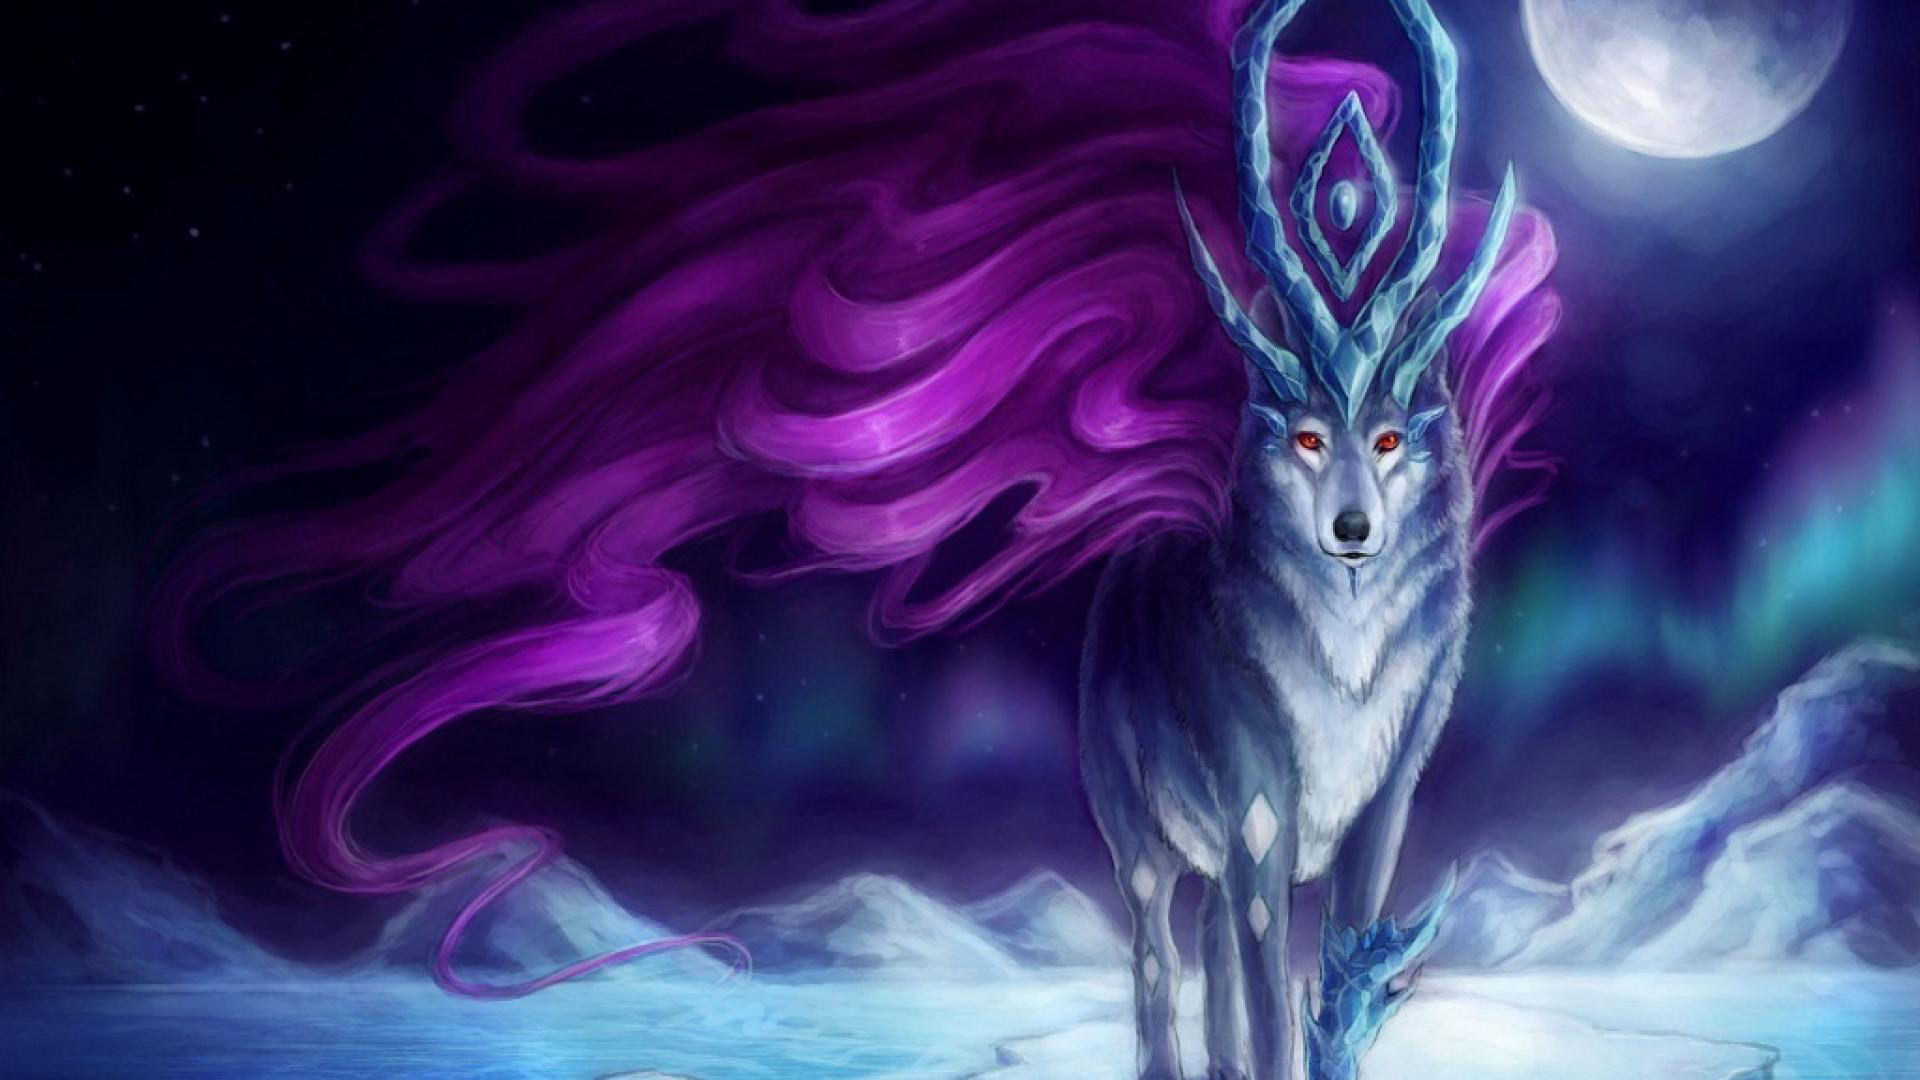 Anime wolf wallpaper wallpapertag - Download anime wallpaper pack ...